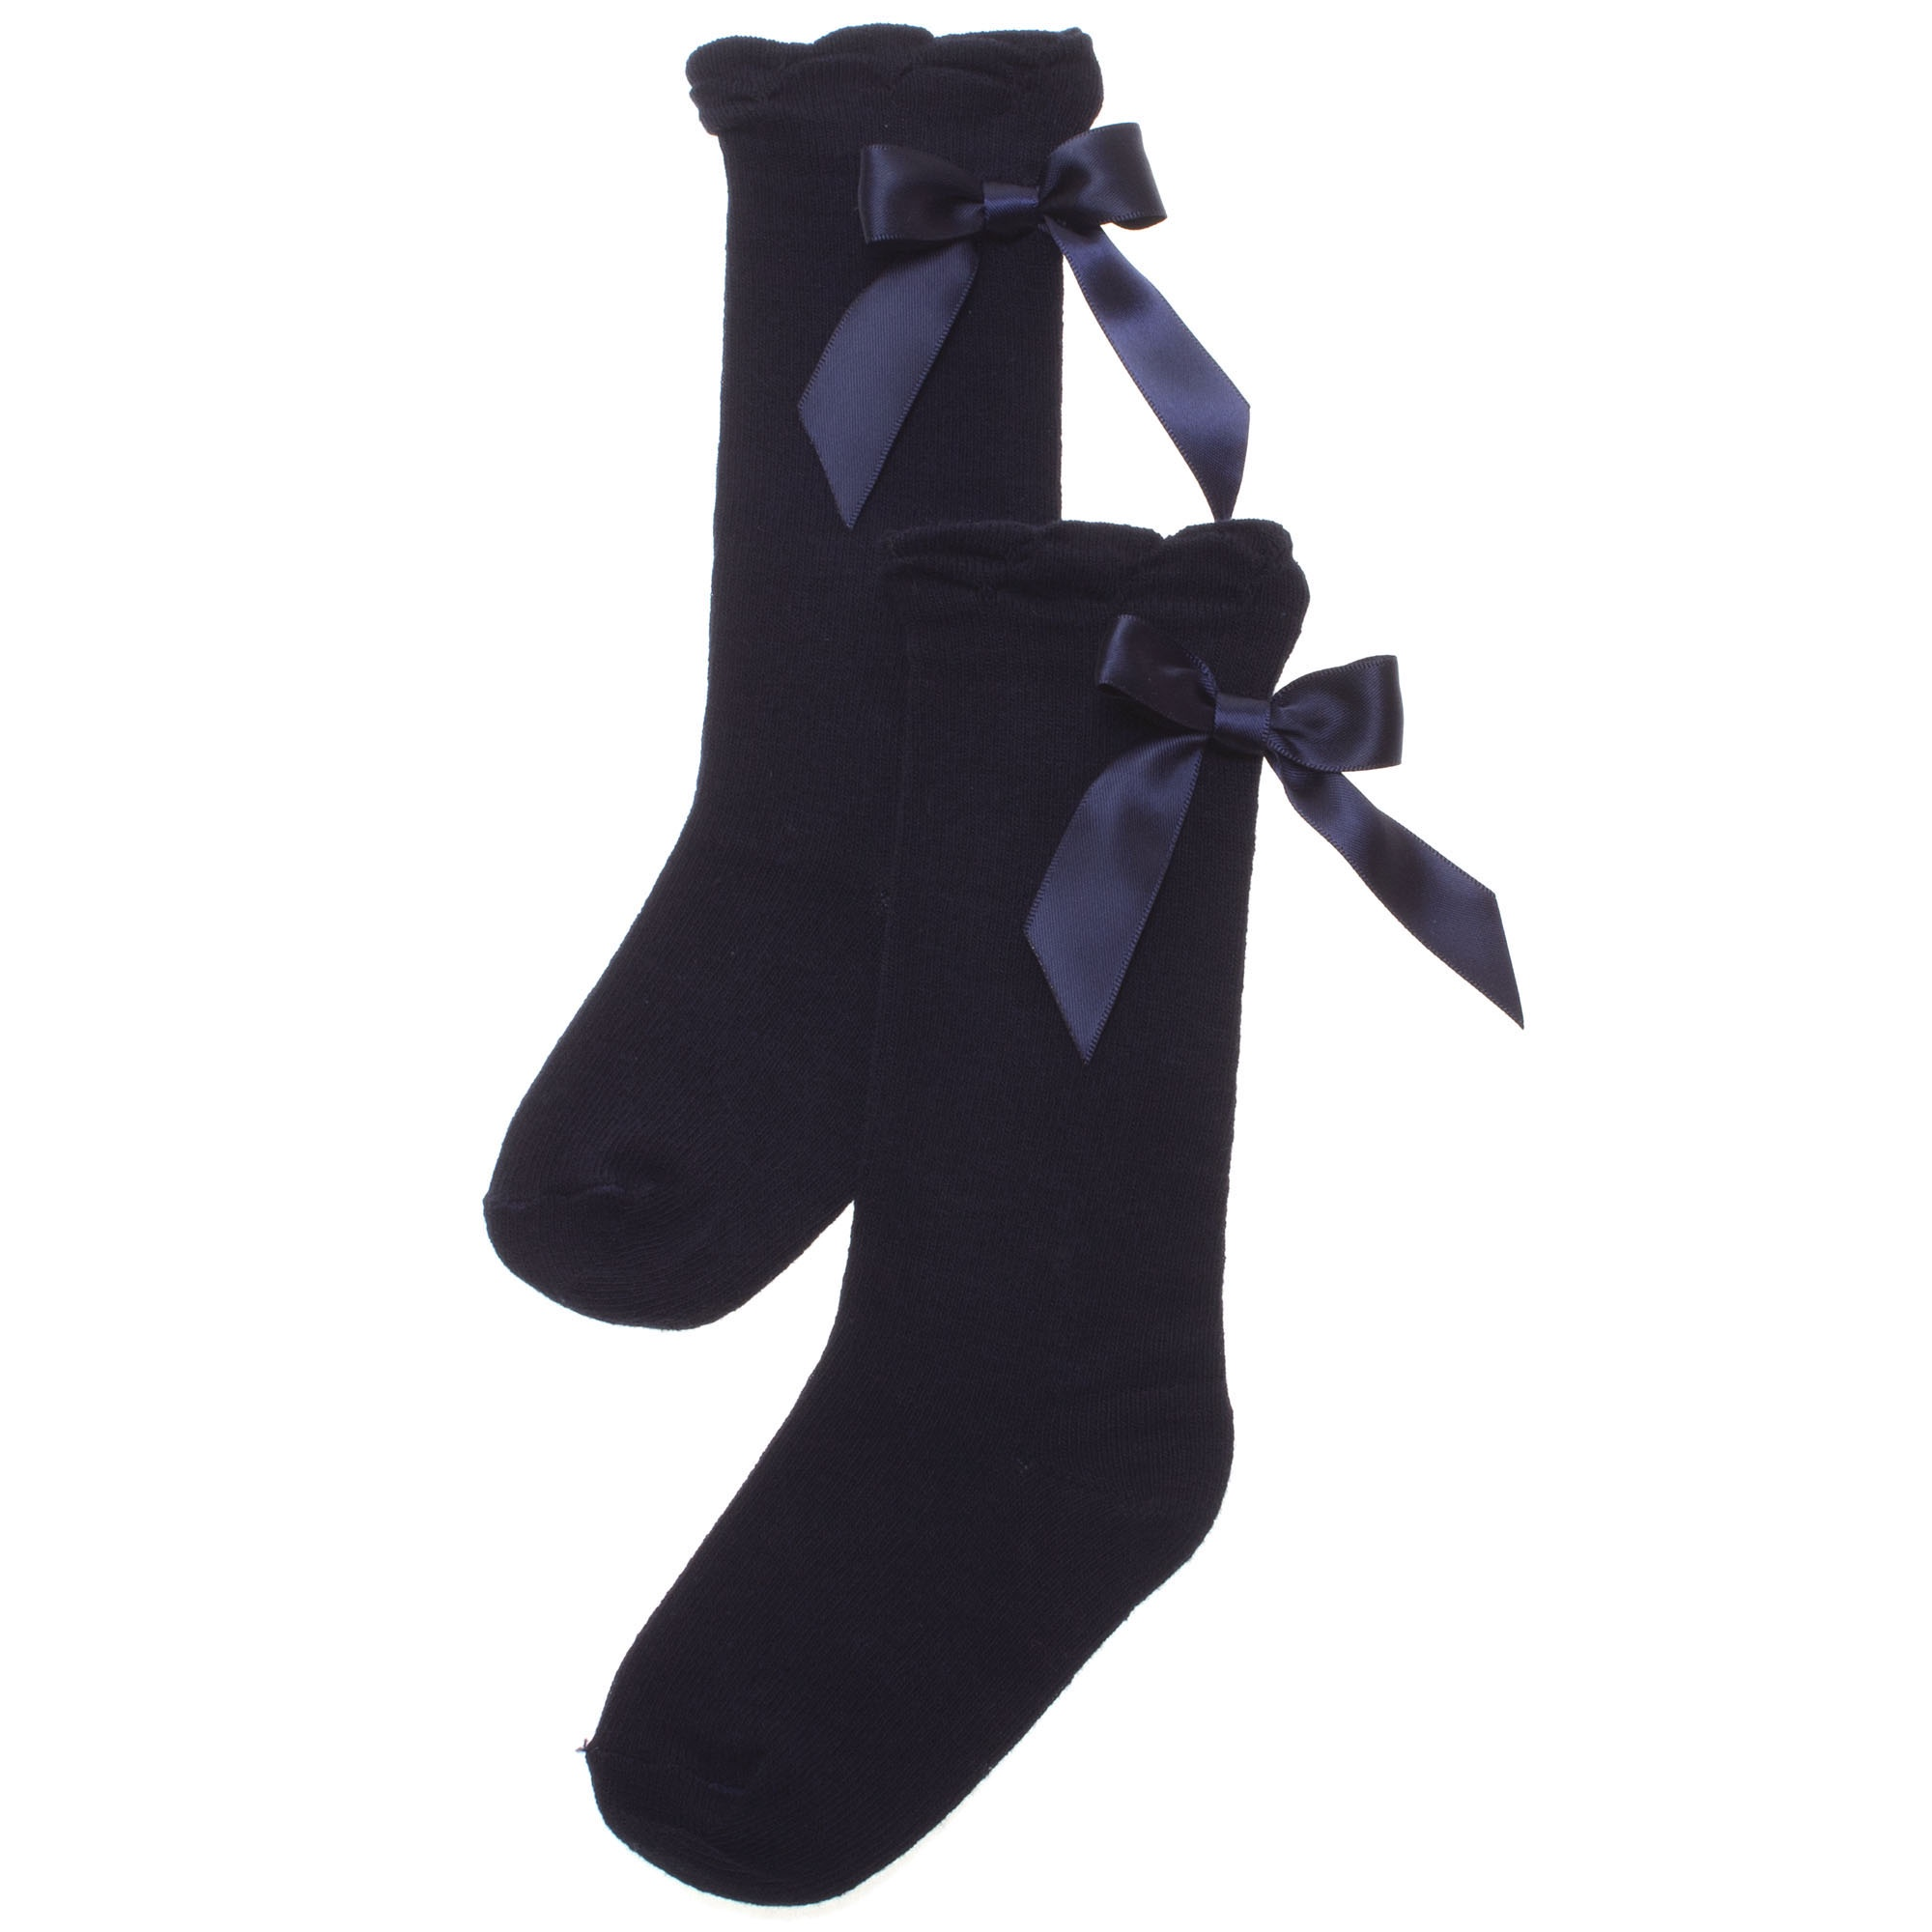 7b26396a592 Pex Ribbon Knee High Socks NAVY